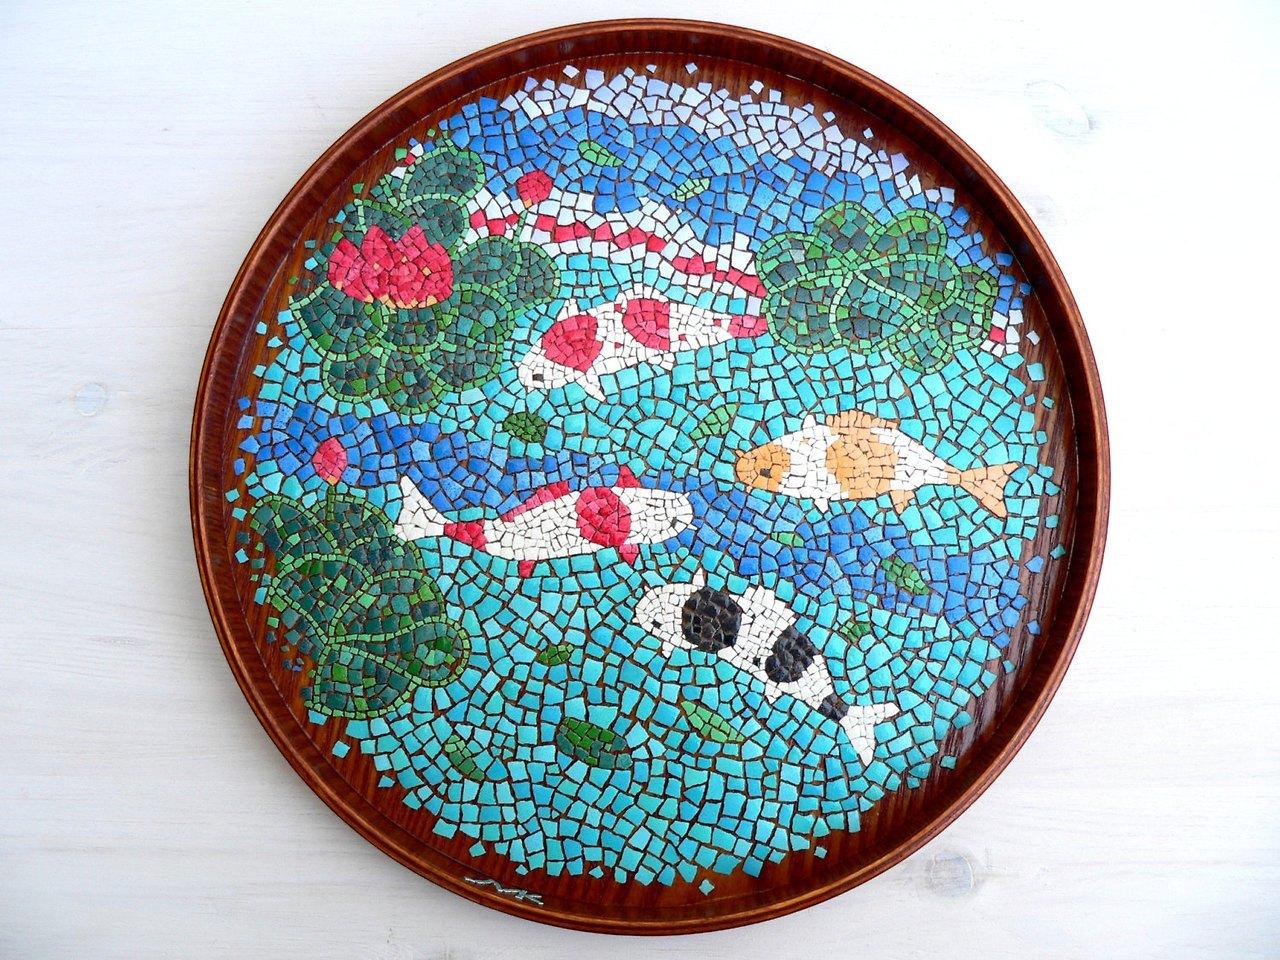 Maria kudriavtzeva mixed media collage art painting for Egg tray wall hanging